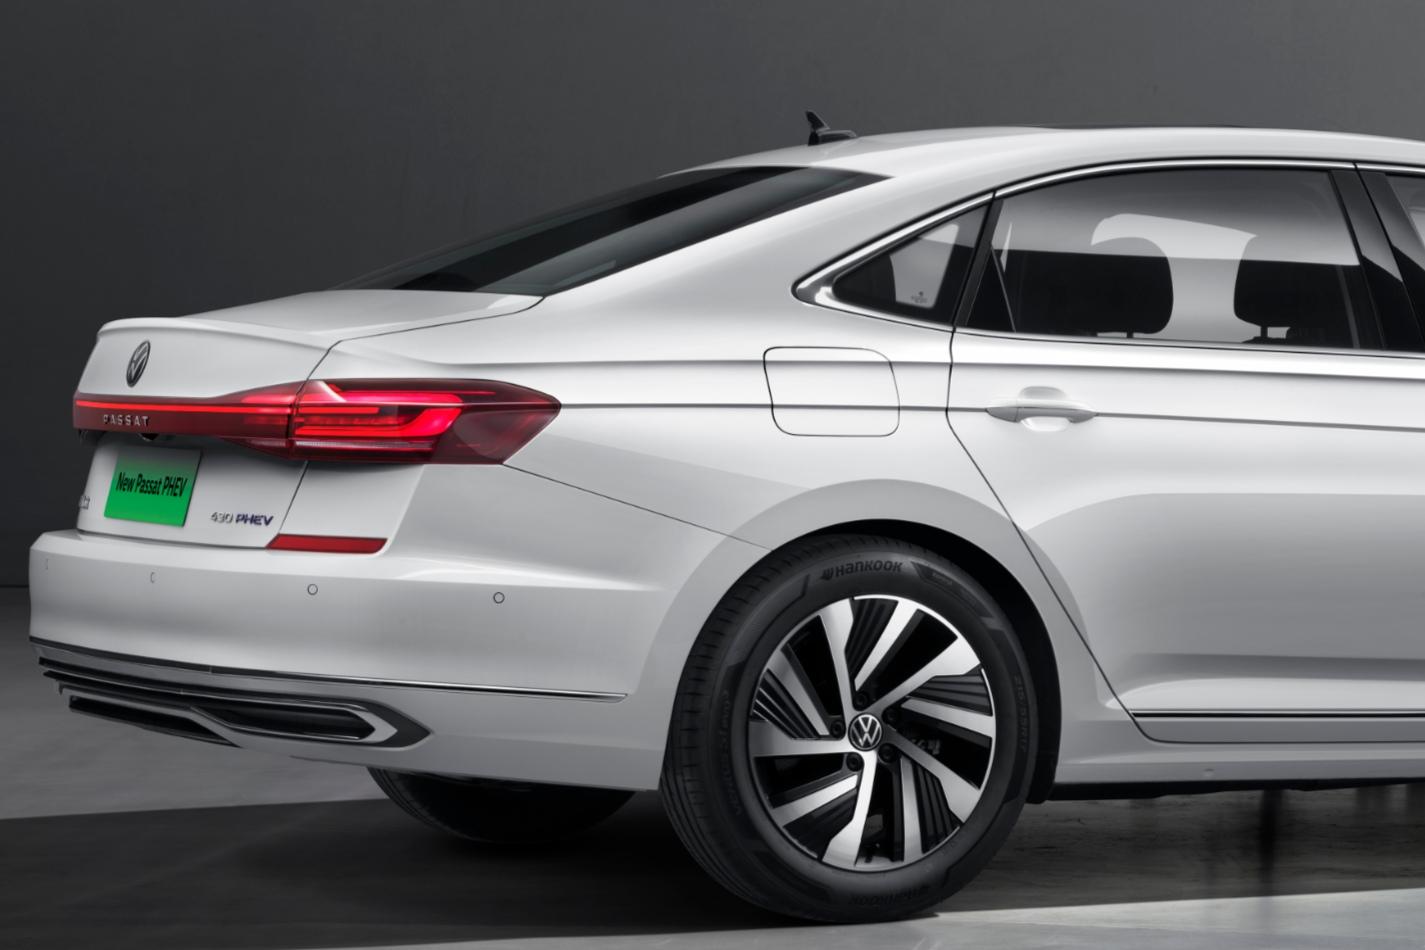 Novo Volkswagen Passat 2021 China porta-malas